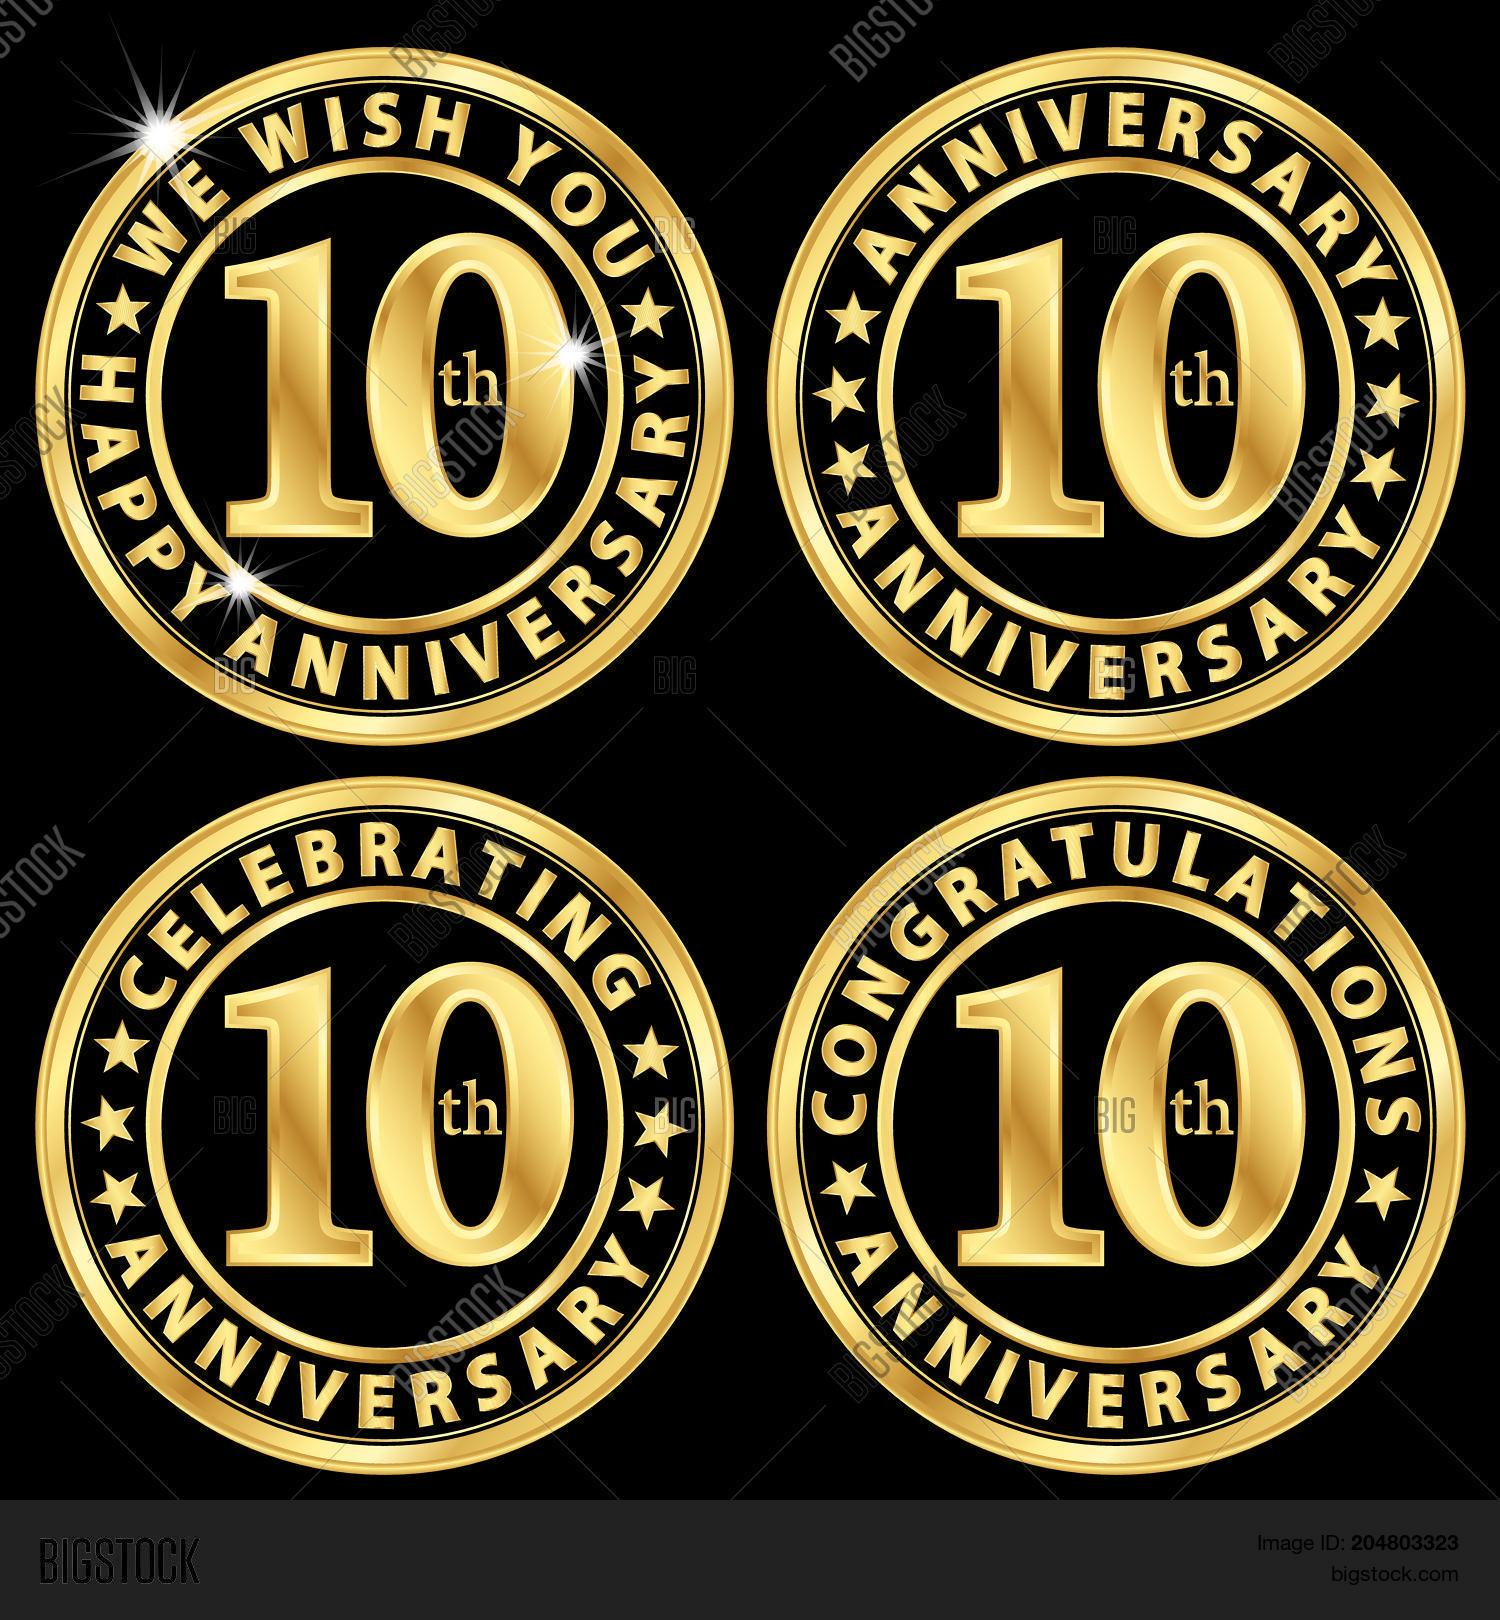 10th Anniversary Vector Photo Free Trial Bigstock